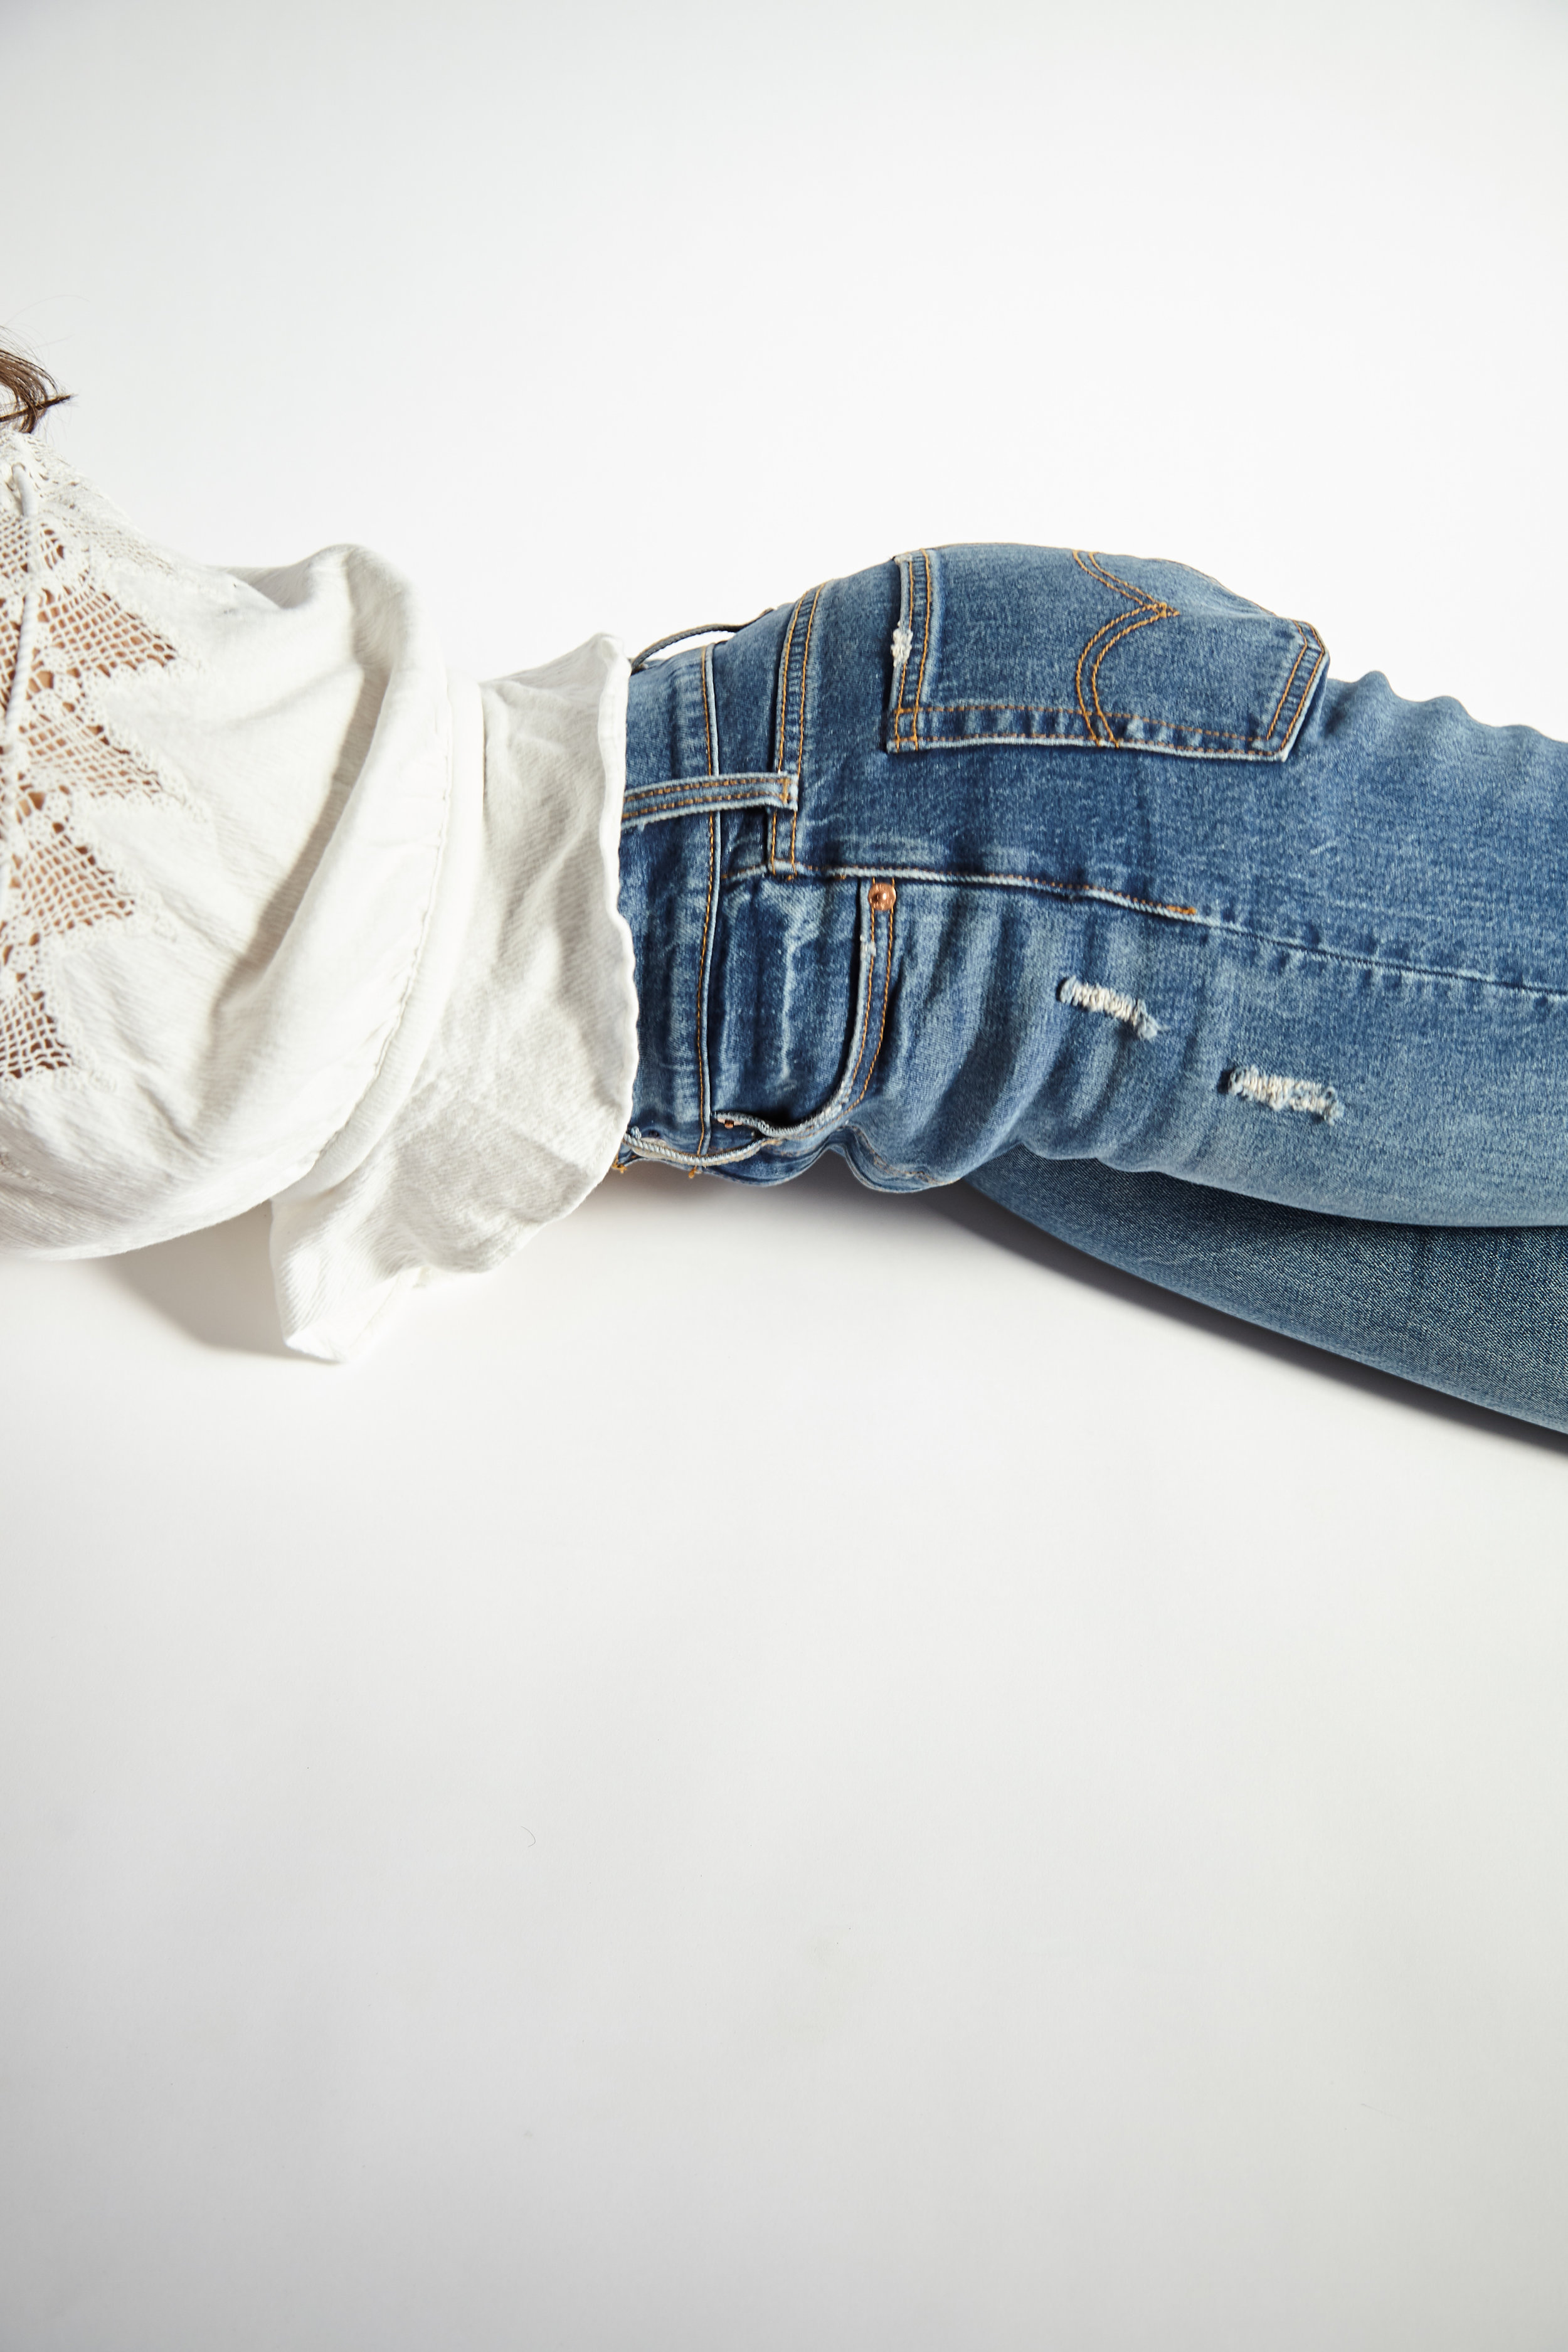 Levis_jeans_should_you_invest.jpg